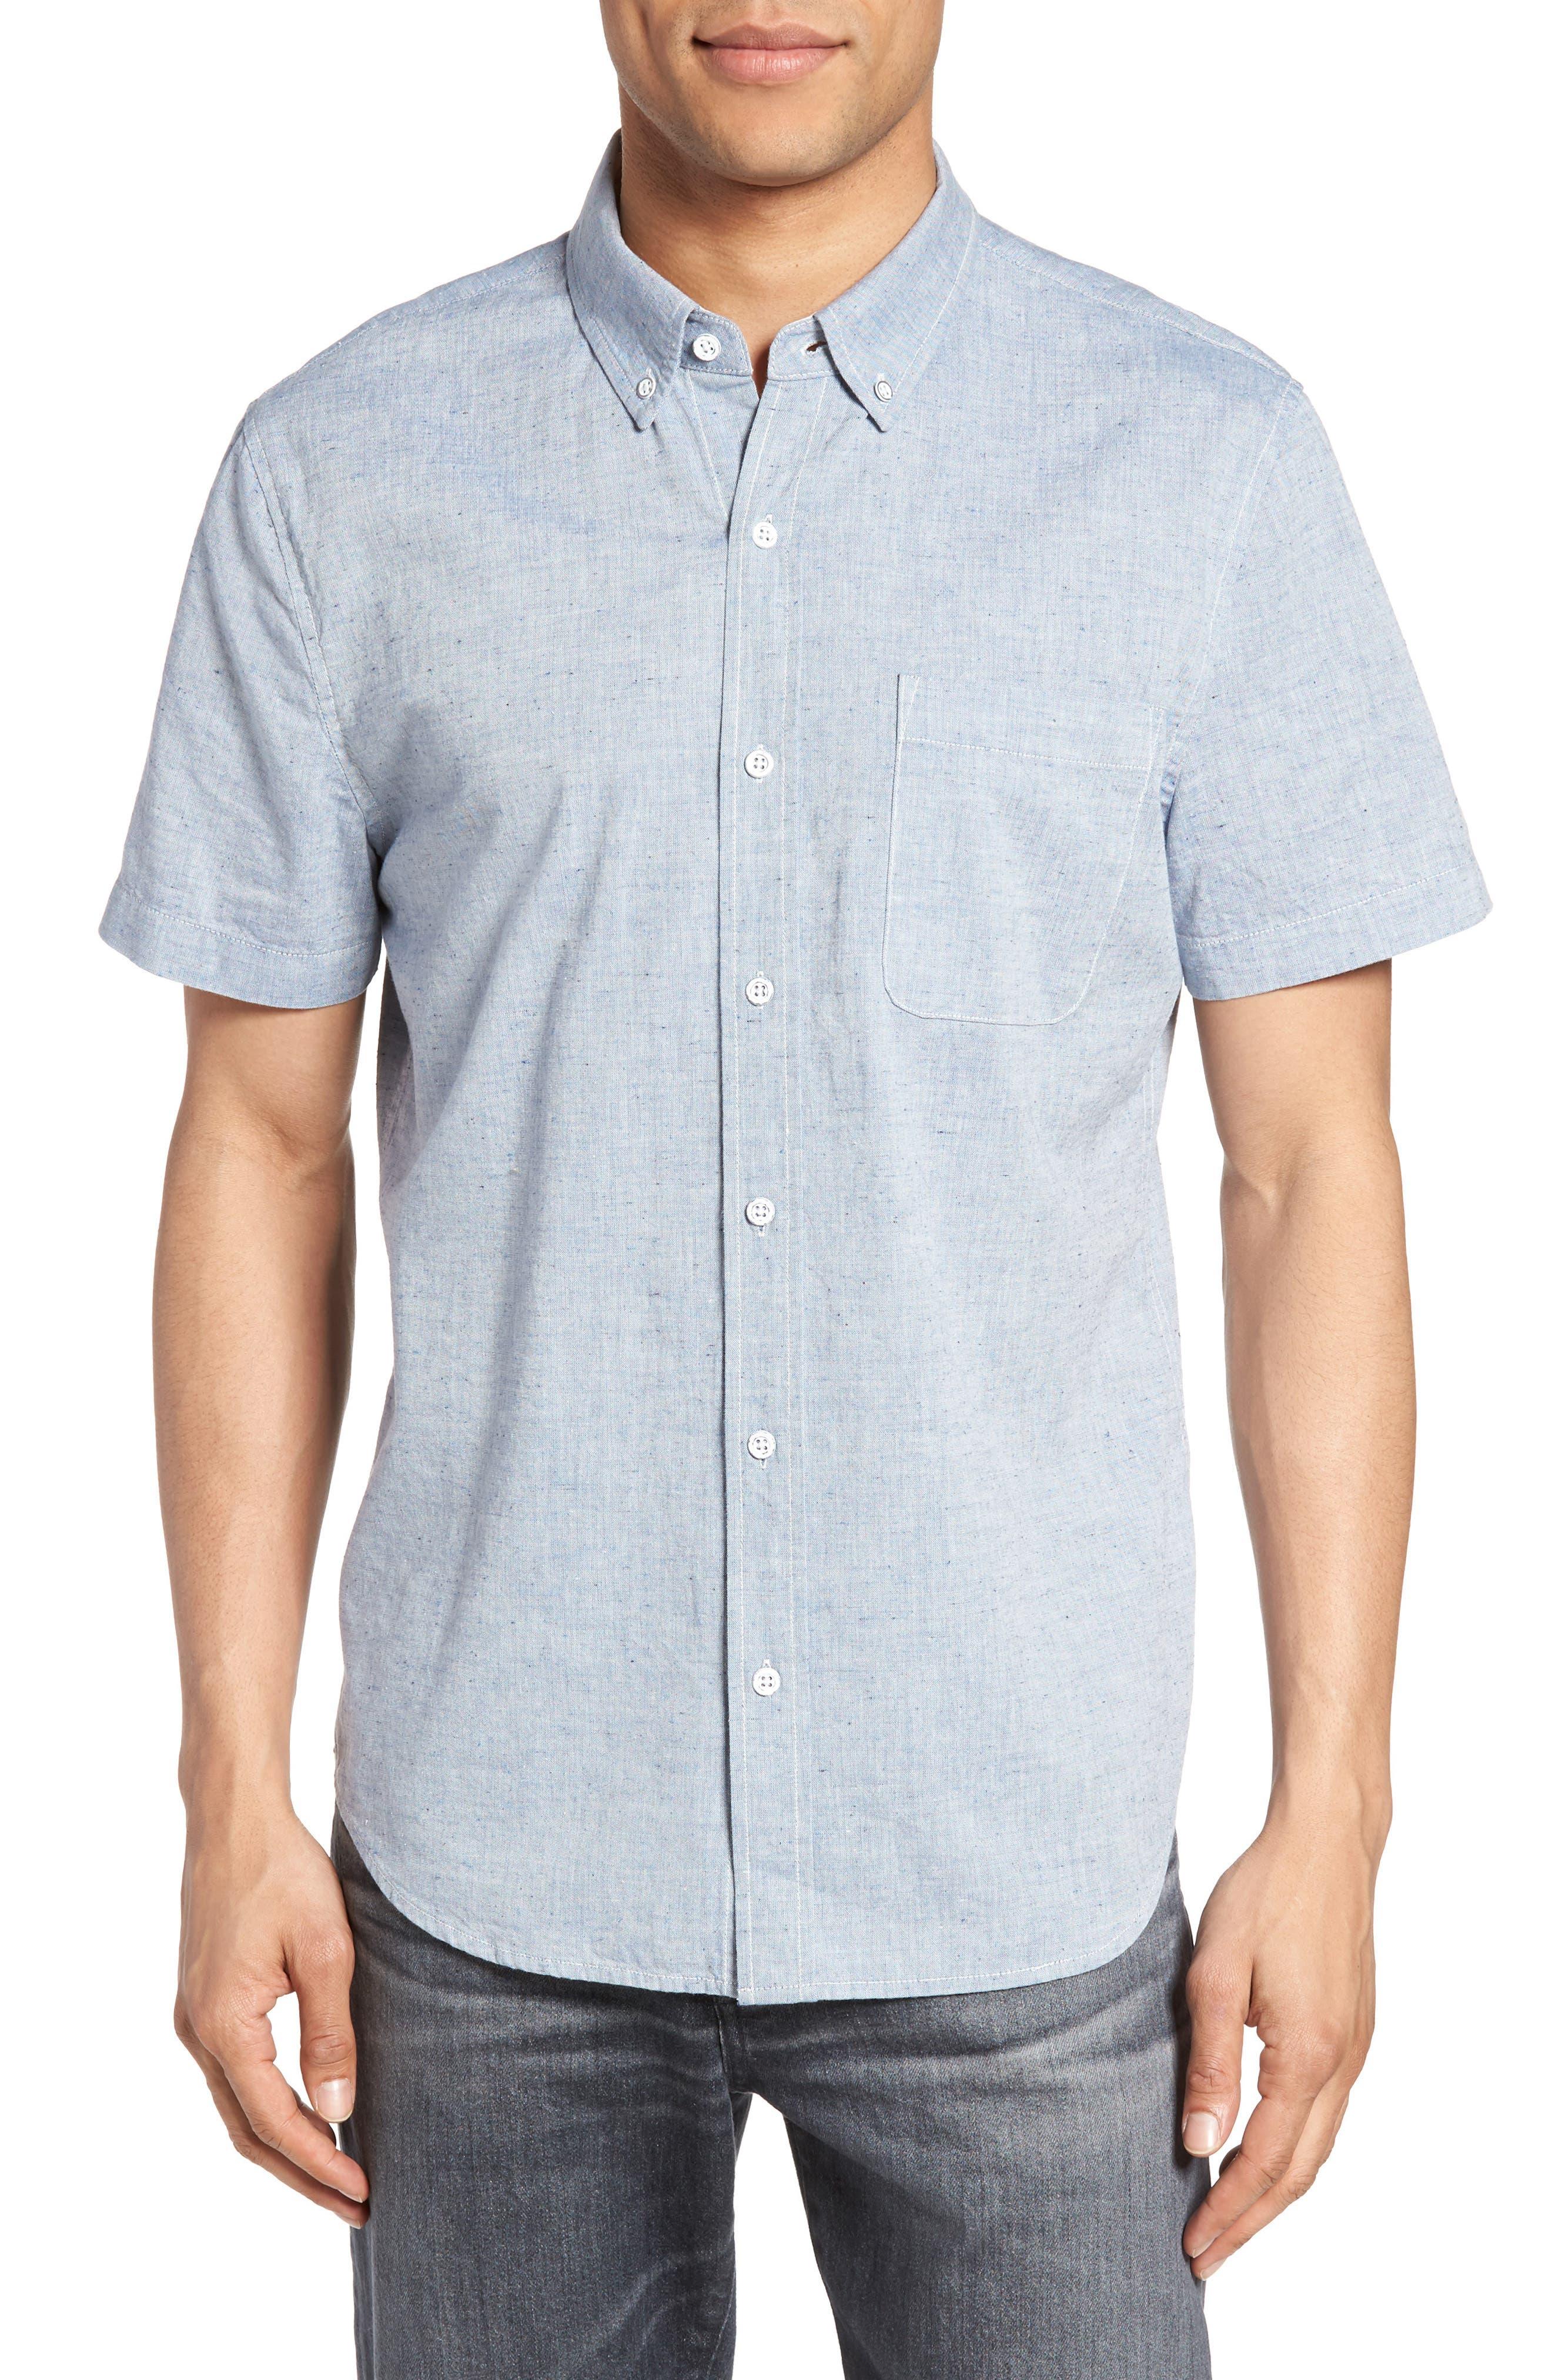 Main Image - AG Nash Slub Cotton Shirt